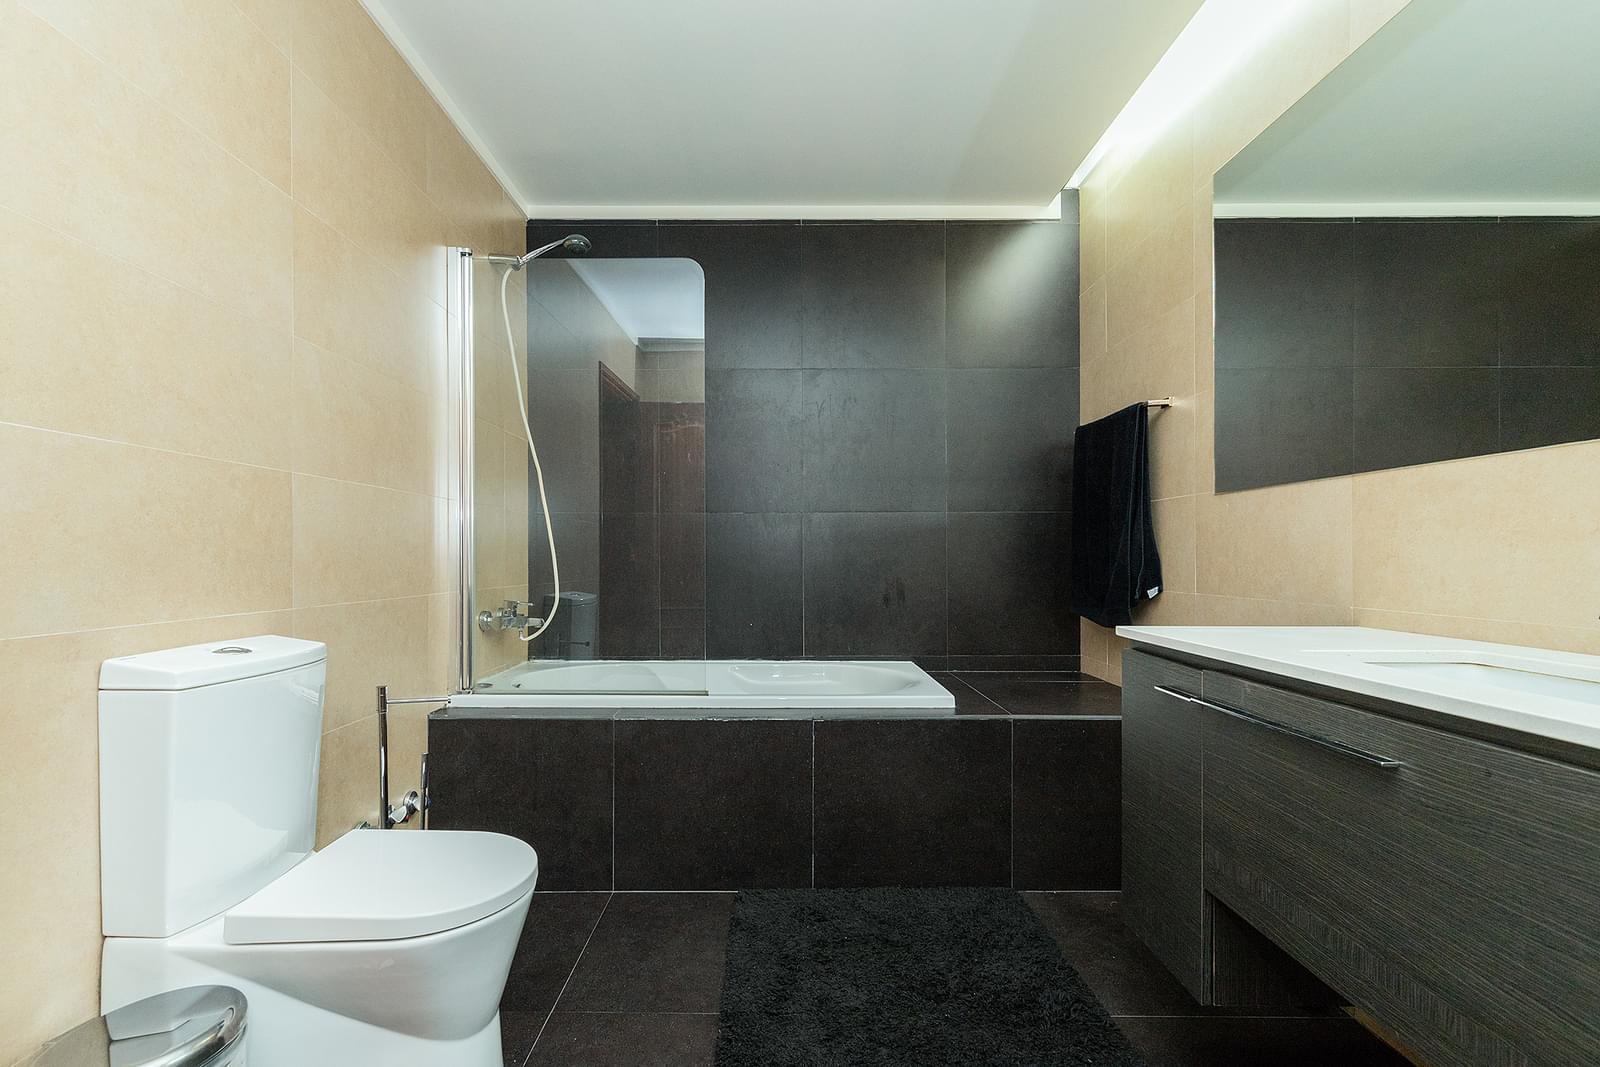 pf17978-apartamento-t3-lisboa-90e2c67c-03c6-440e-957e-e69b60756941